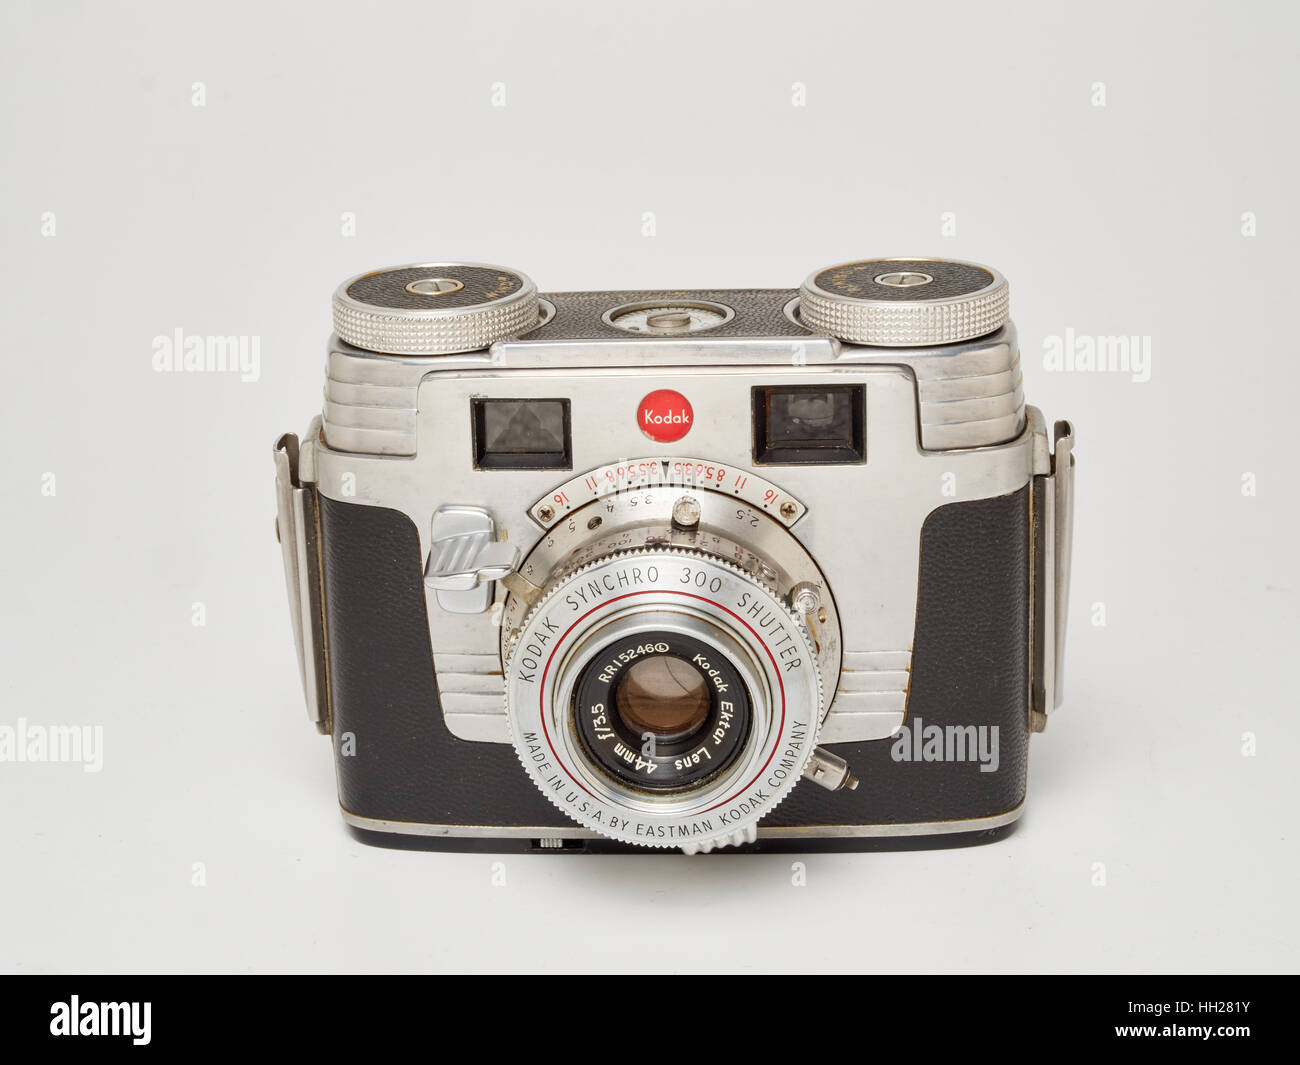 Signet Stock Photos & Signet Stock Images - Alamy